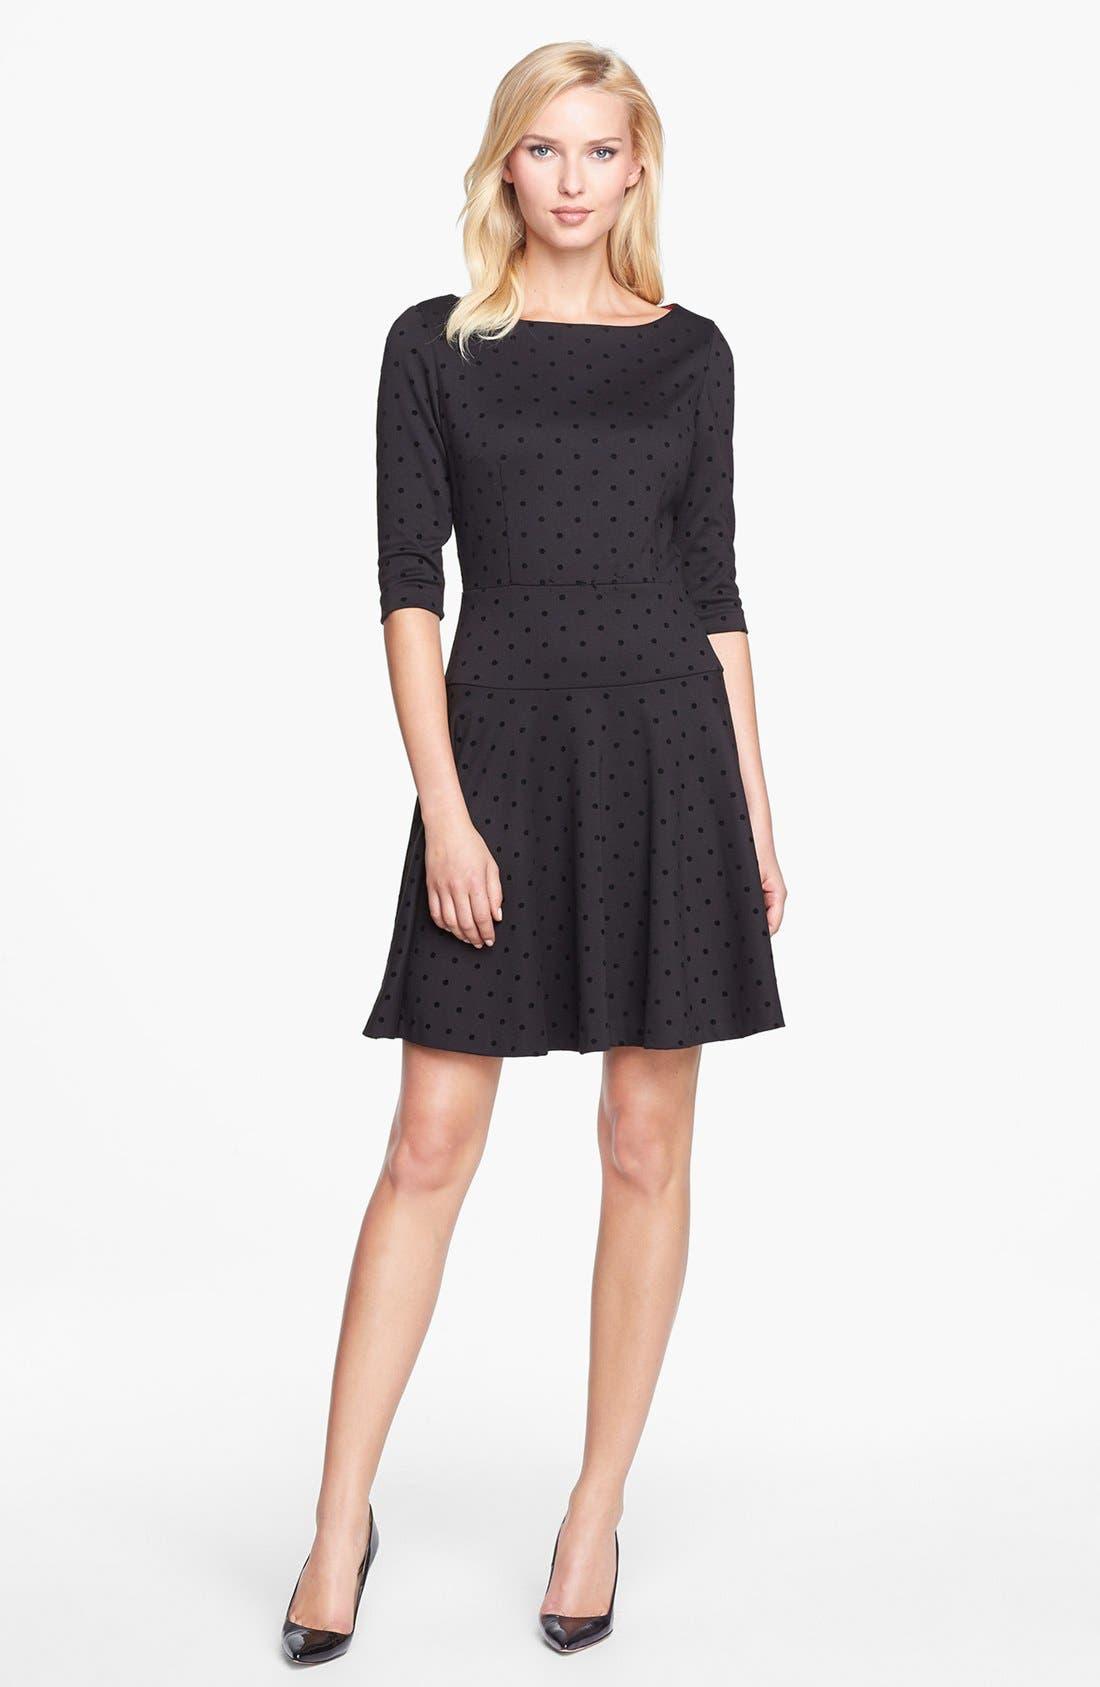 Main Image - Tahari Flocked Dot Ponte Knit Fit & Flare Dress